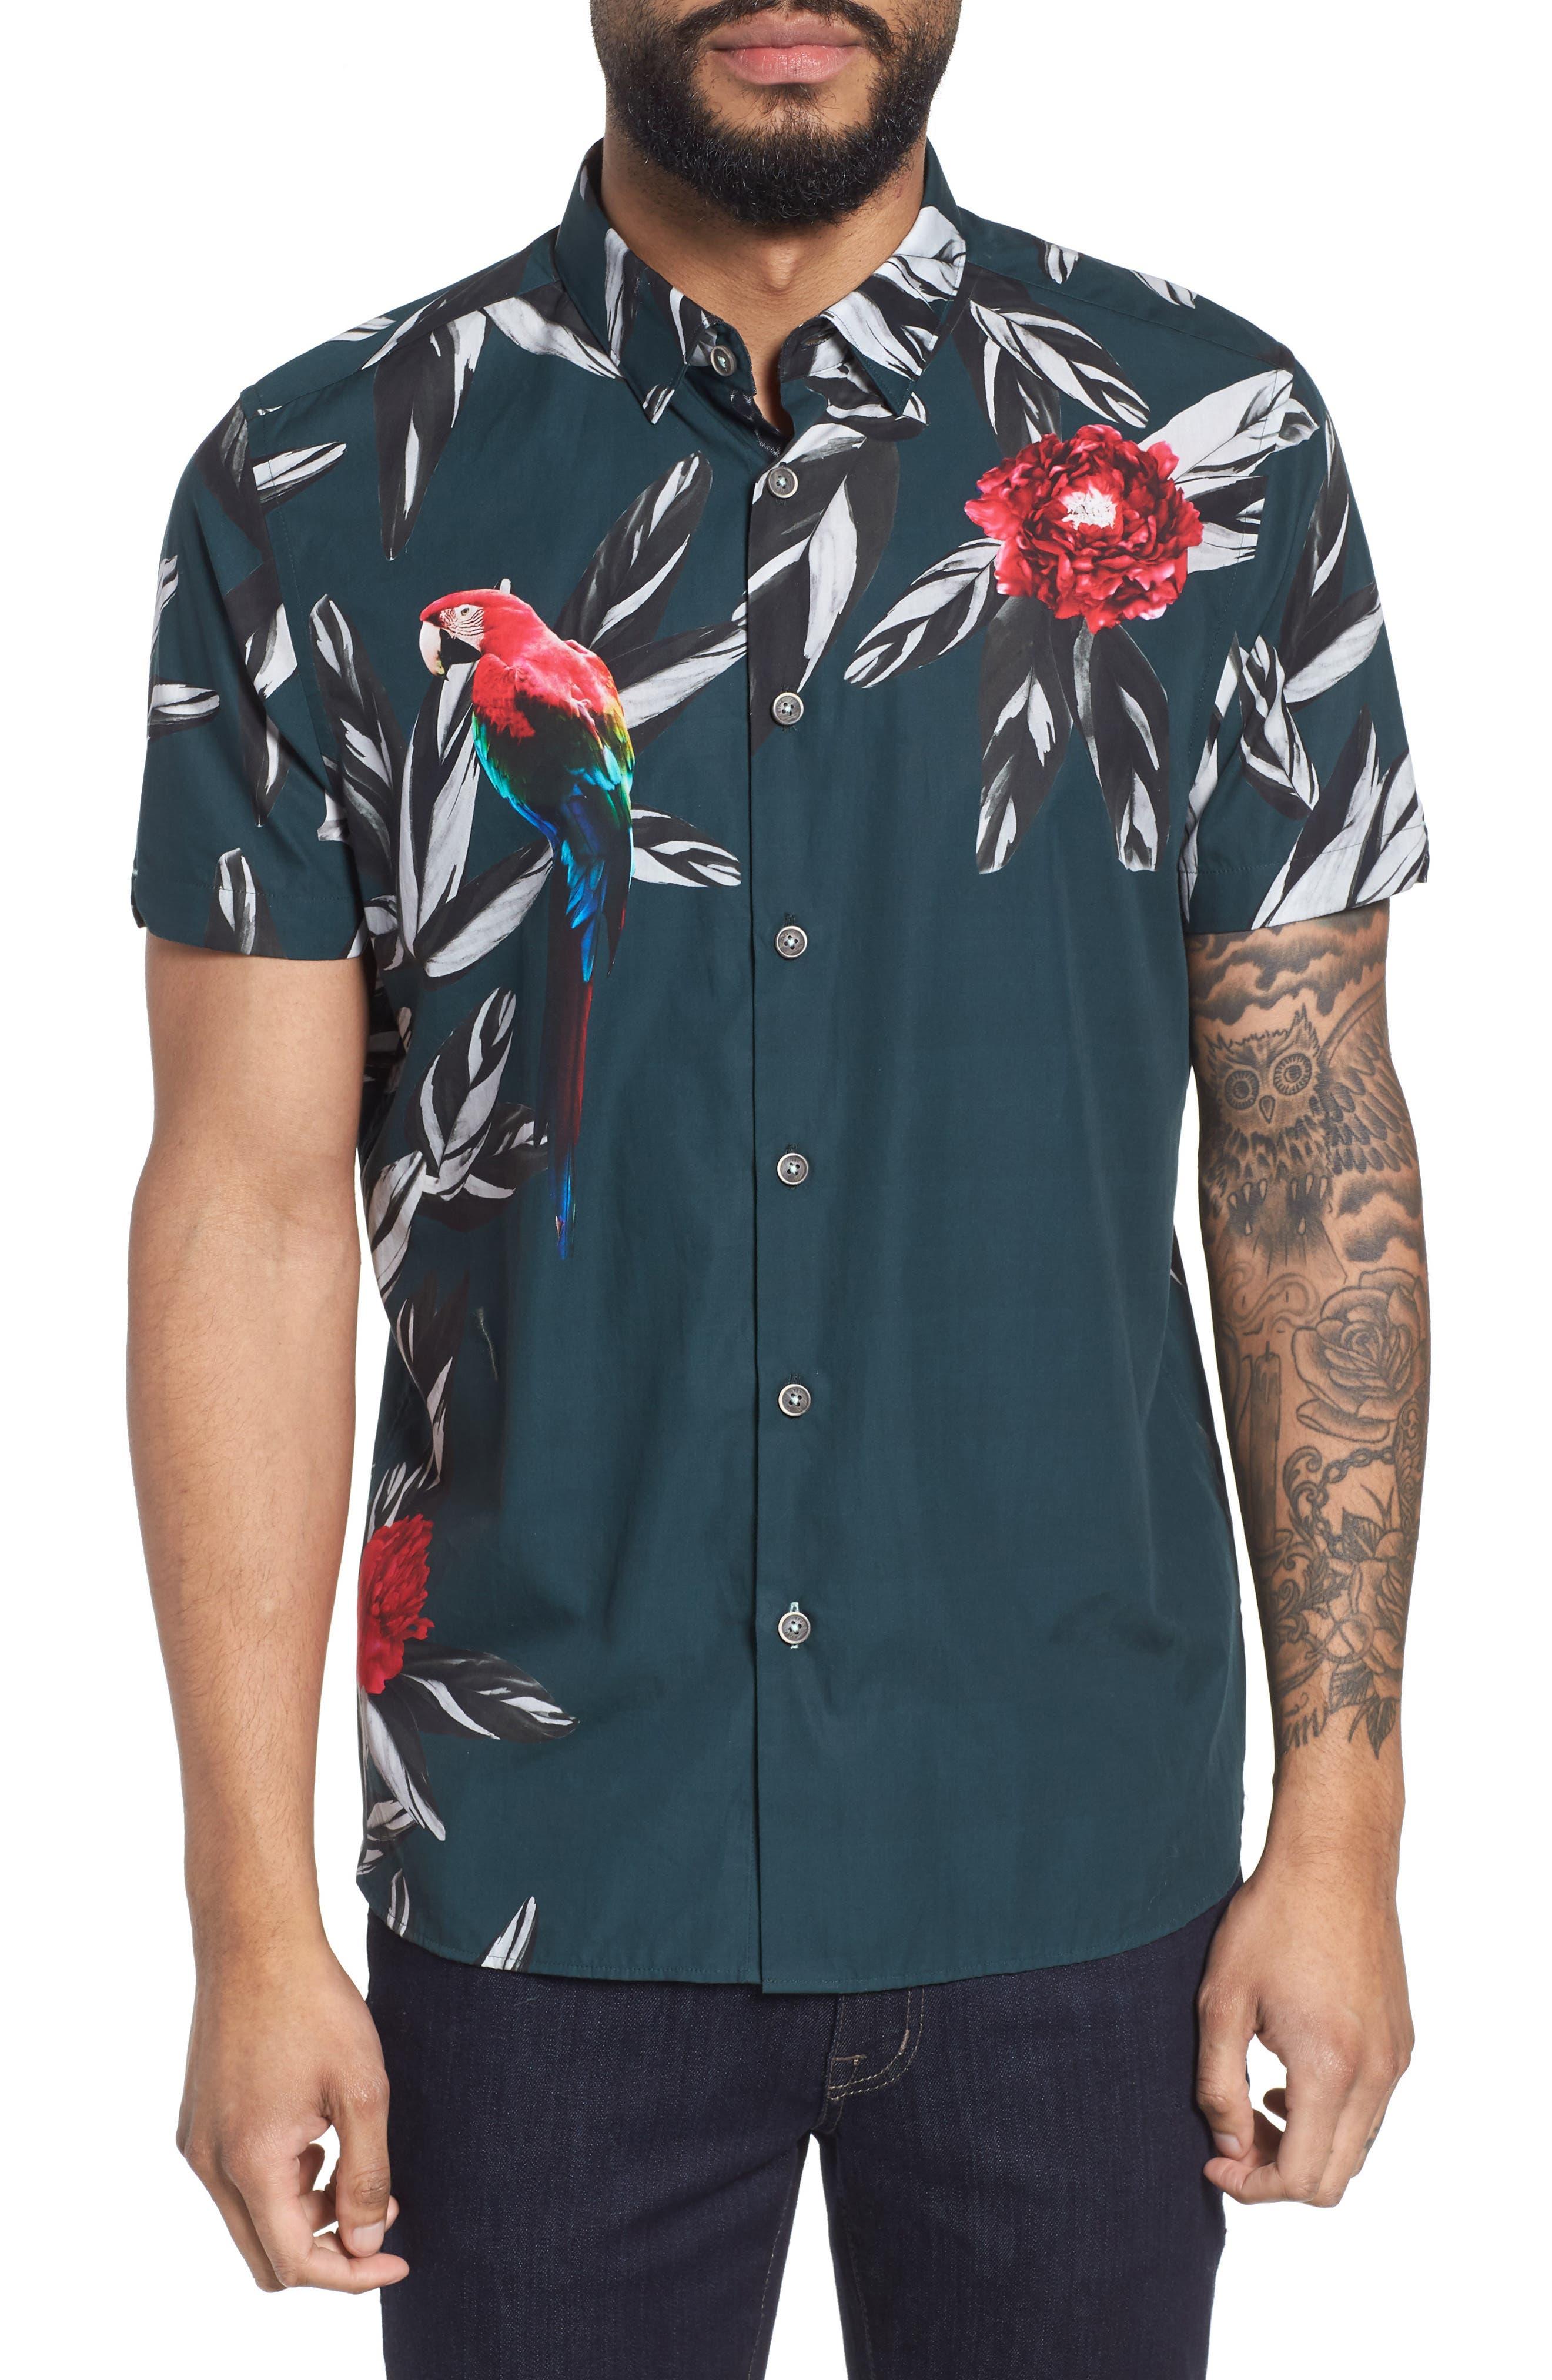 Parrot Print Short Sleeve Sport Shirt,                             Main thumbnail 1, color,                             301